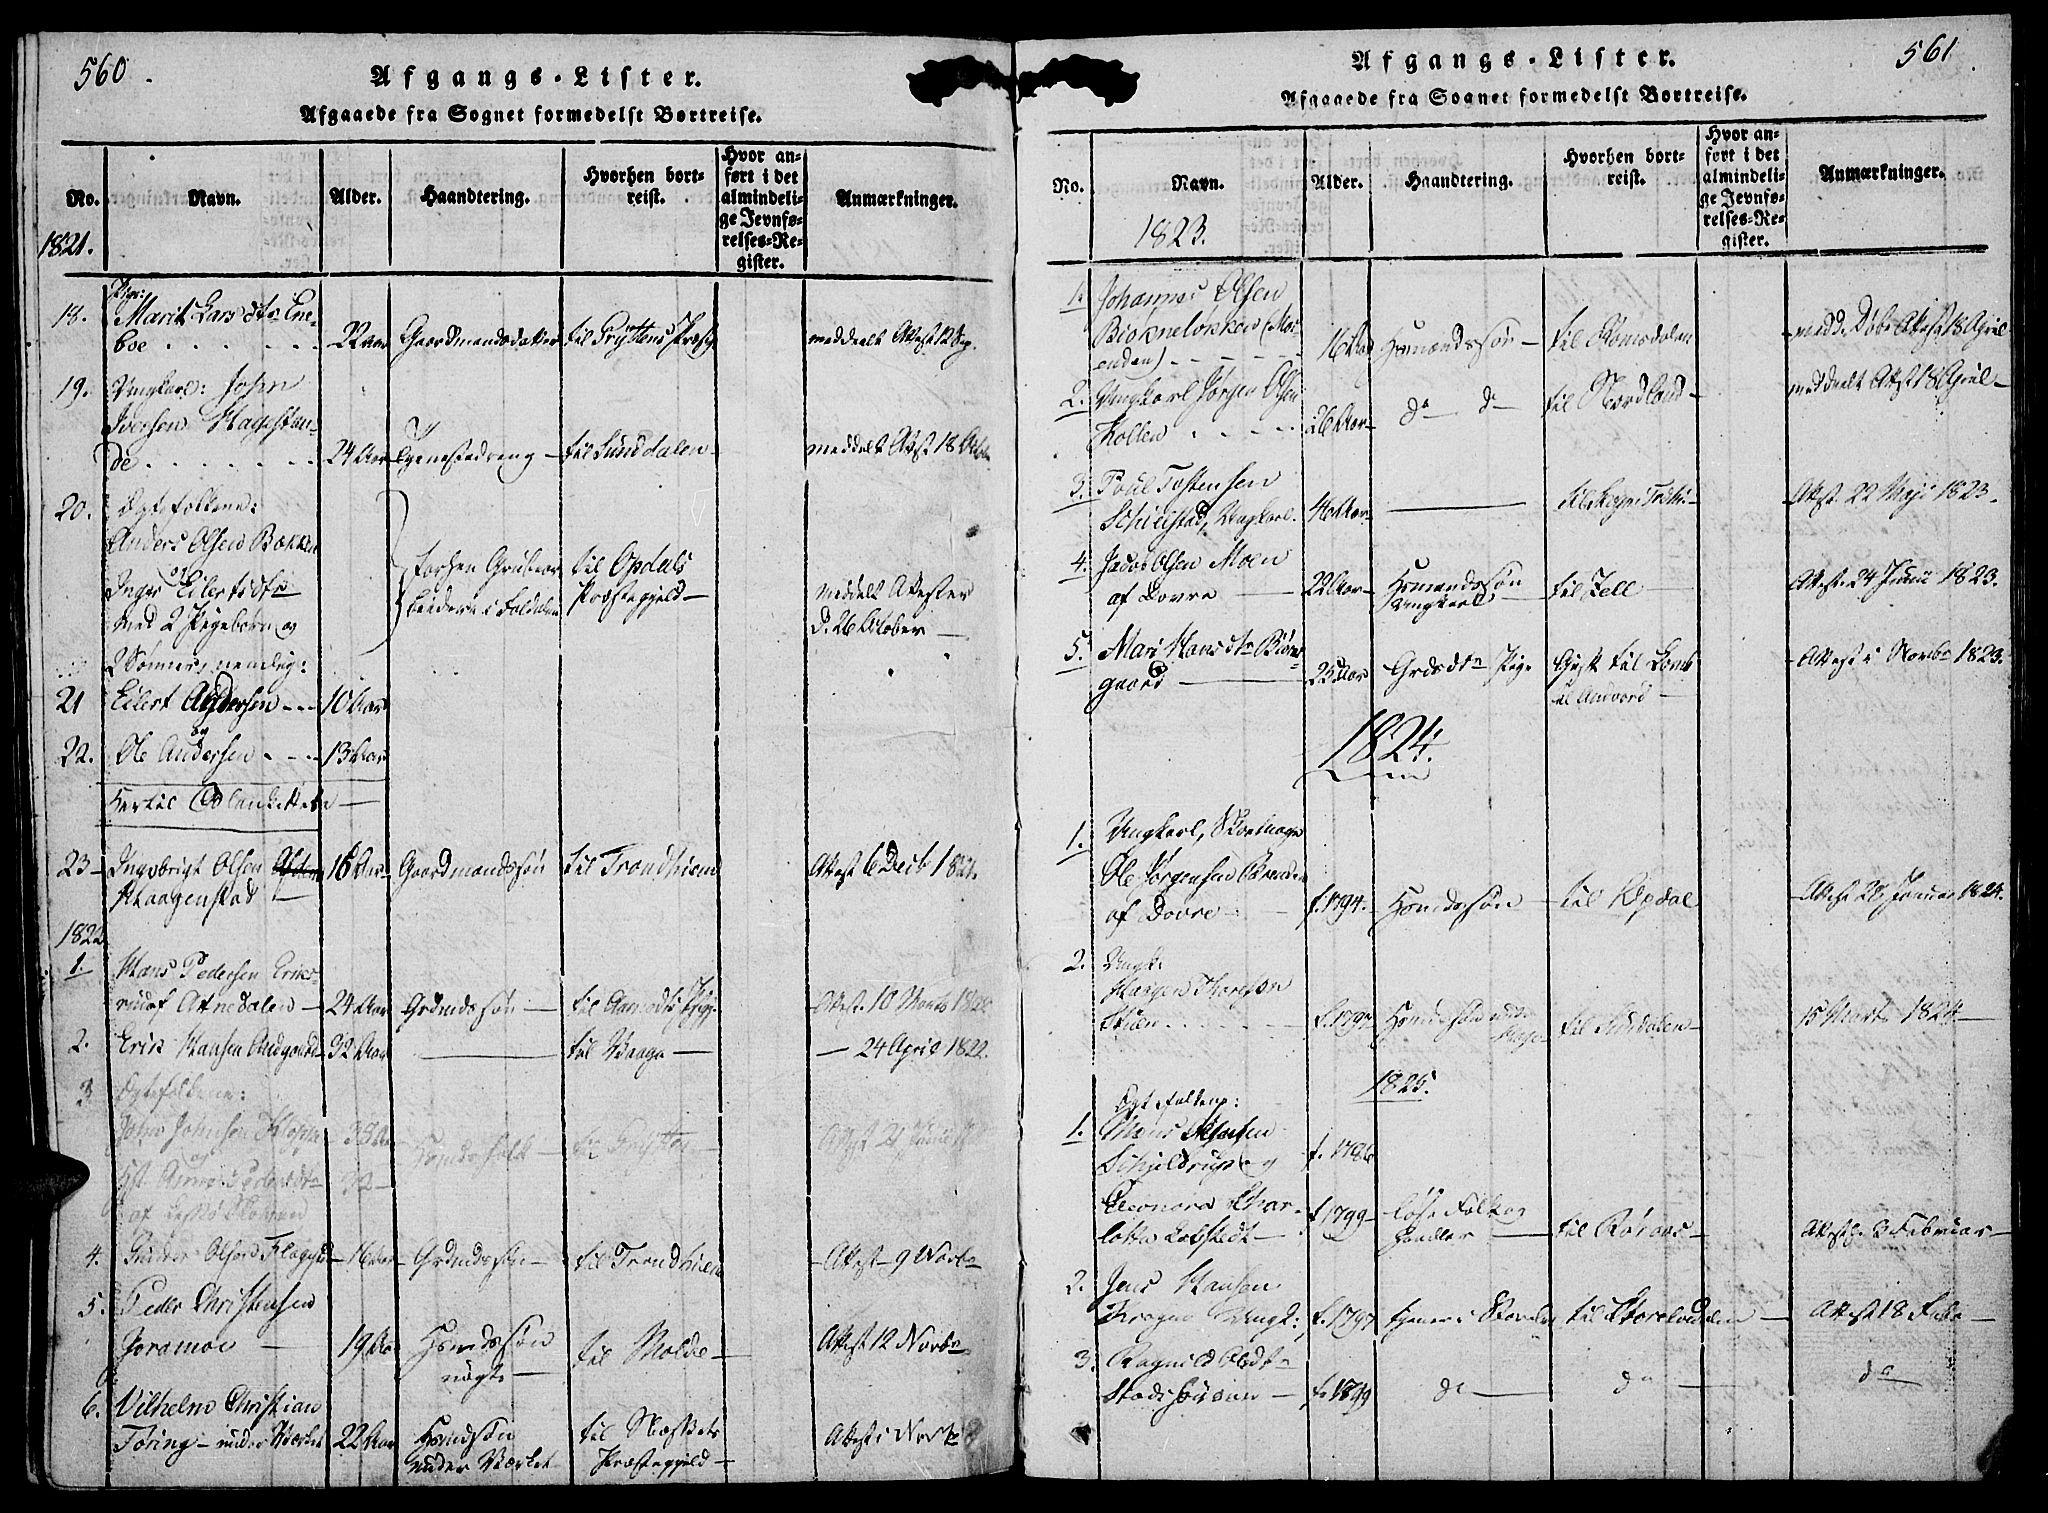 SAH, Lesja prestekontor, Ministerialbok nr. 4, 1820-1829, s. 560-561